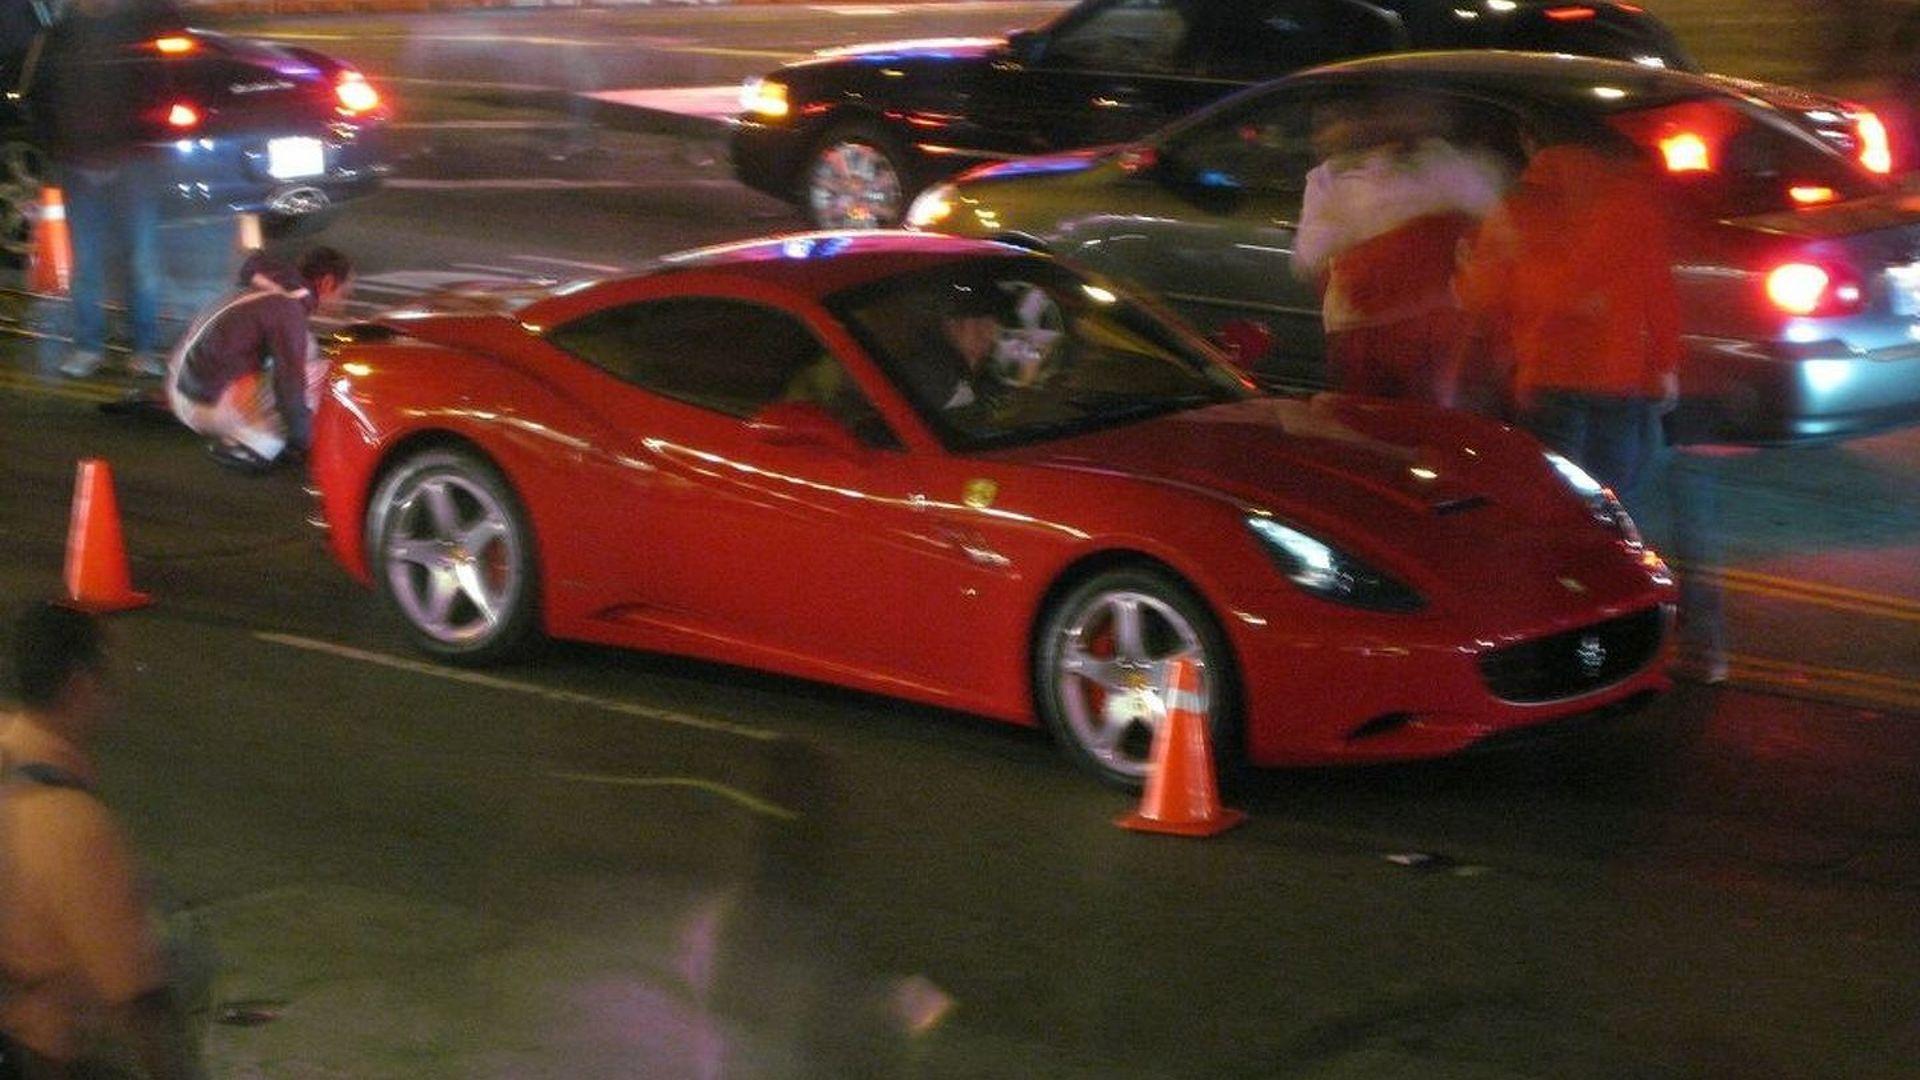 Ferrari California Caught During a Promotional Photo Shoot